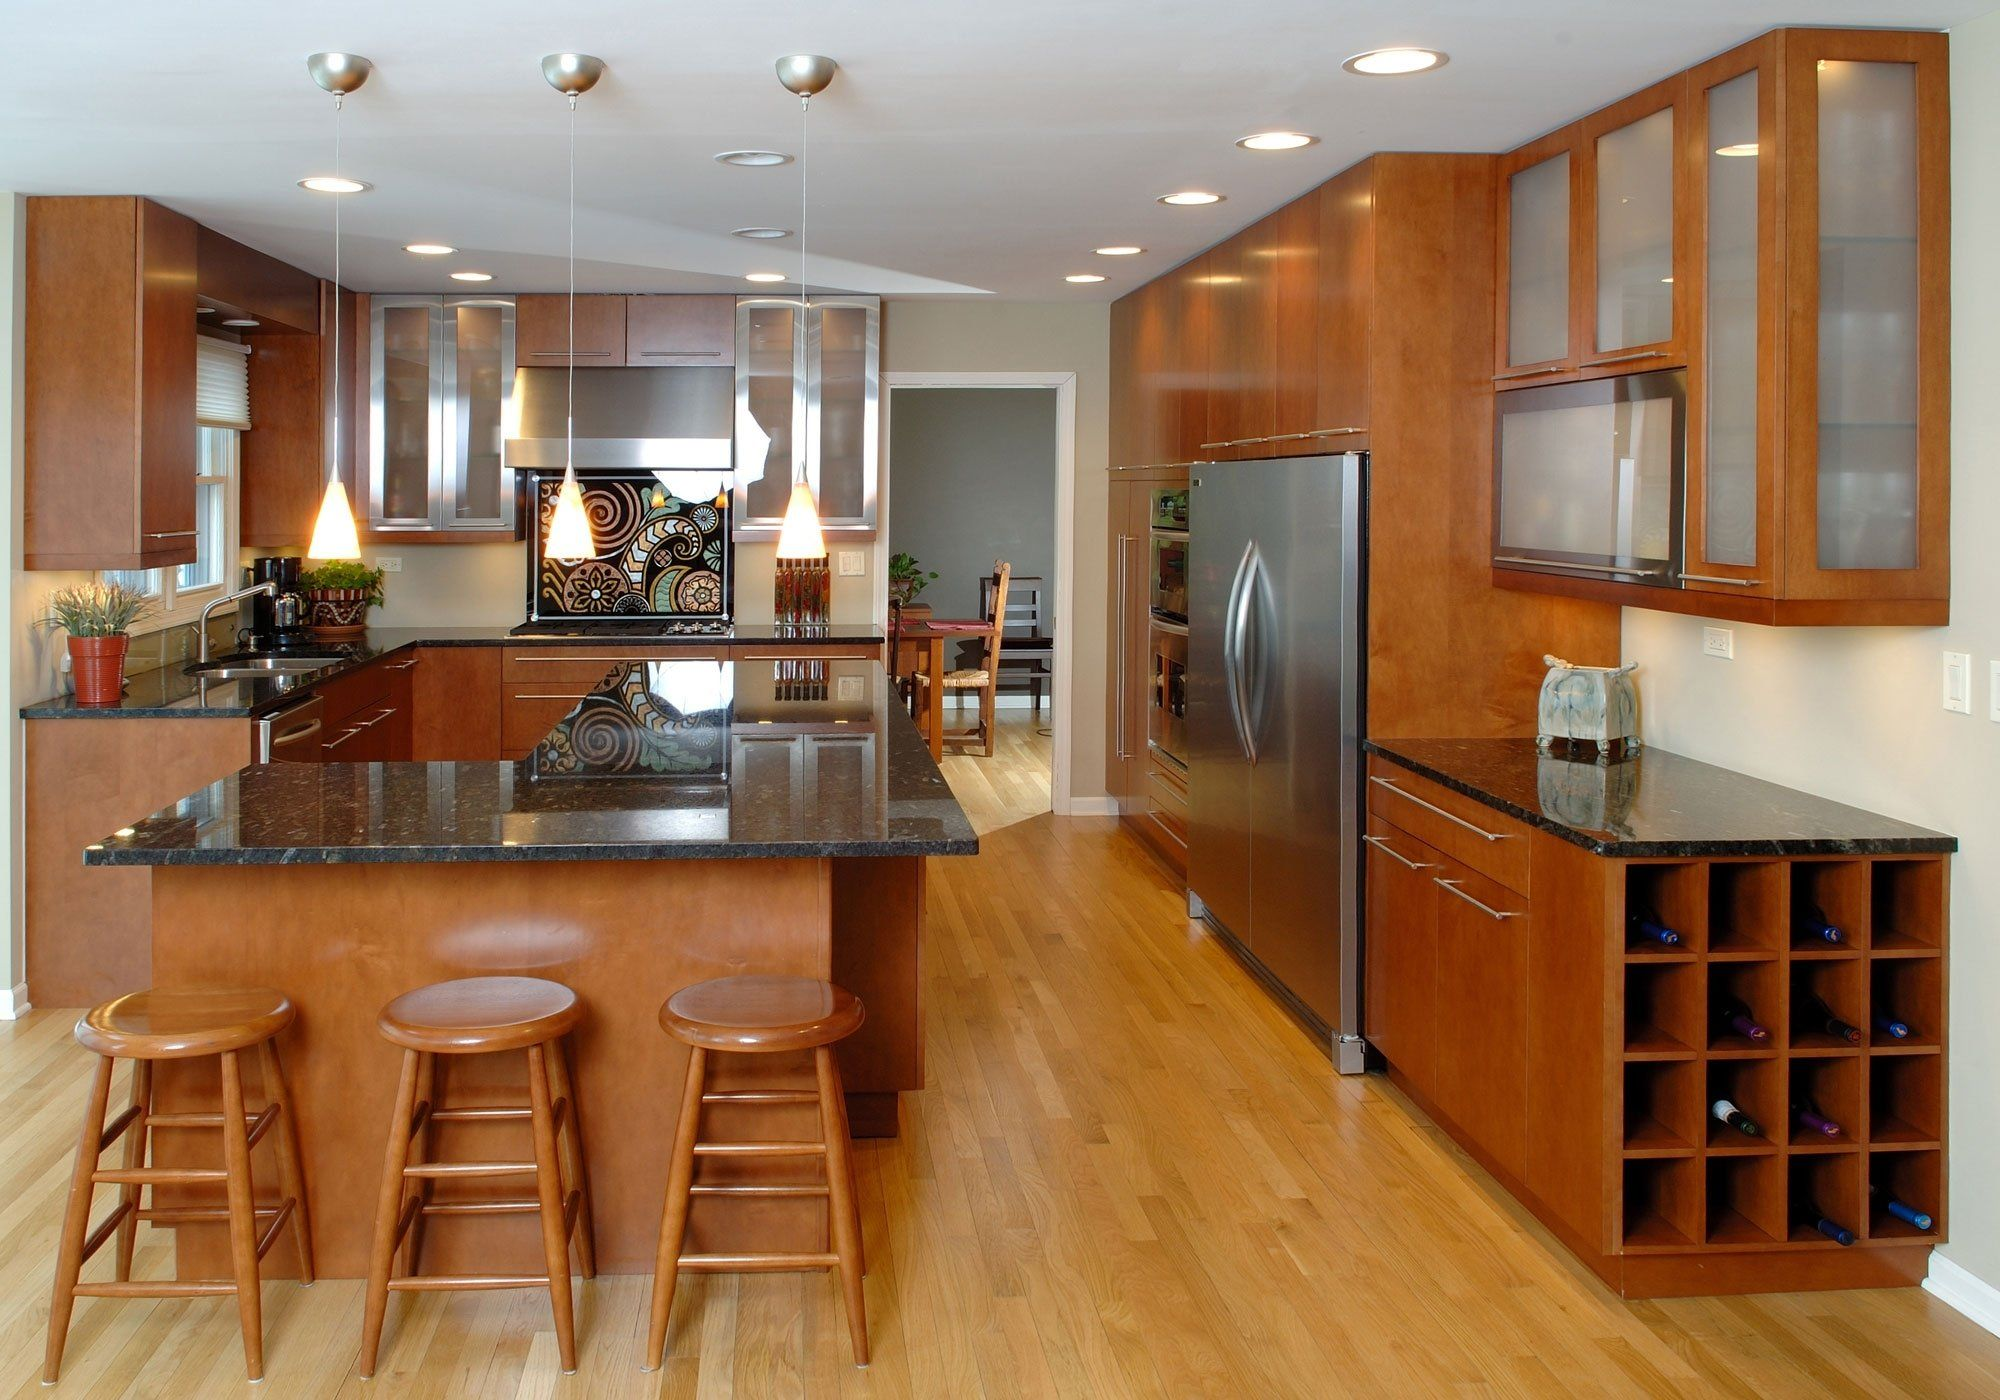 White Kitchen With Light Maple Floors Wonderful Maple Kitchen Cabinets With Dark Wood Floo Quality Kitchen Cabinets Maple Kitchen Cabinets Kraftmaid Kitchens